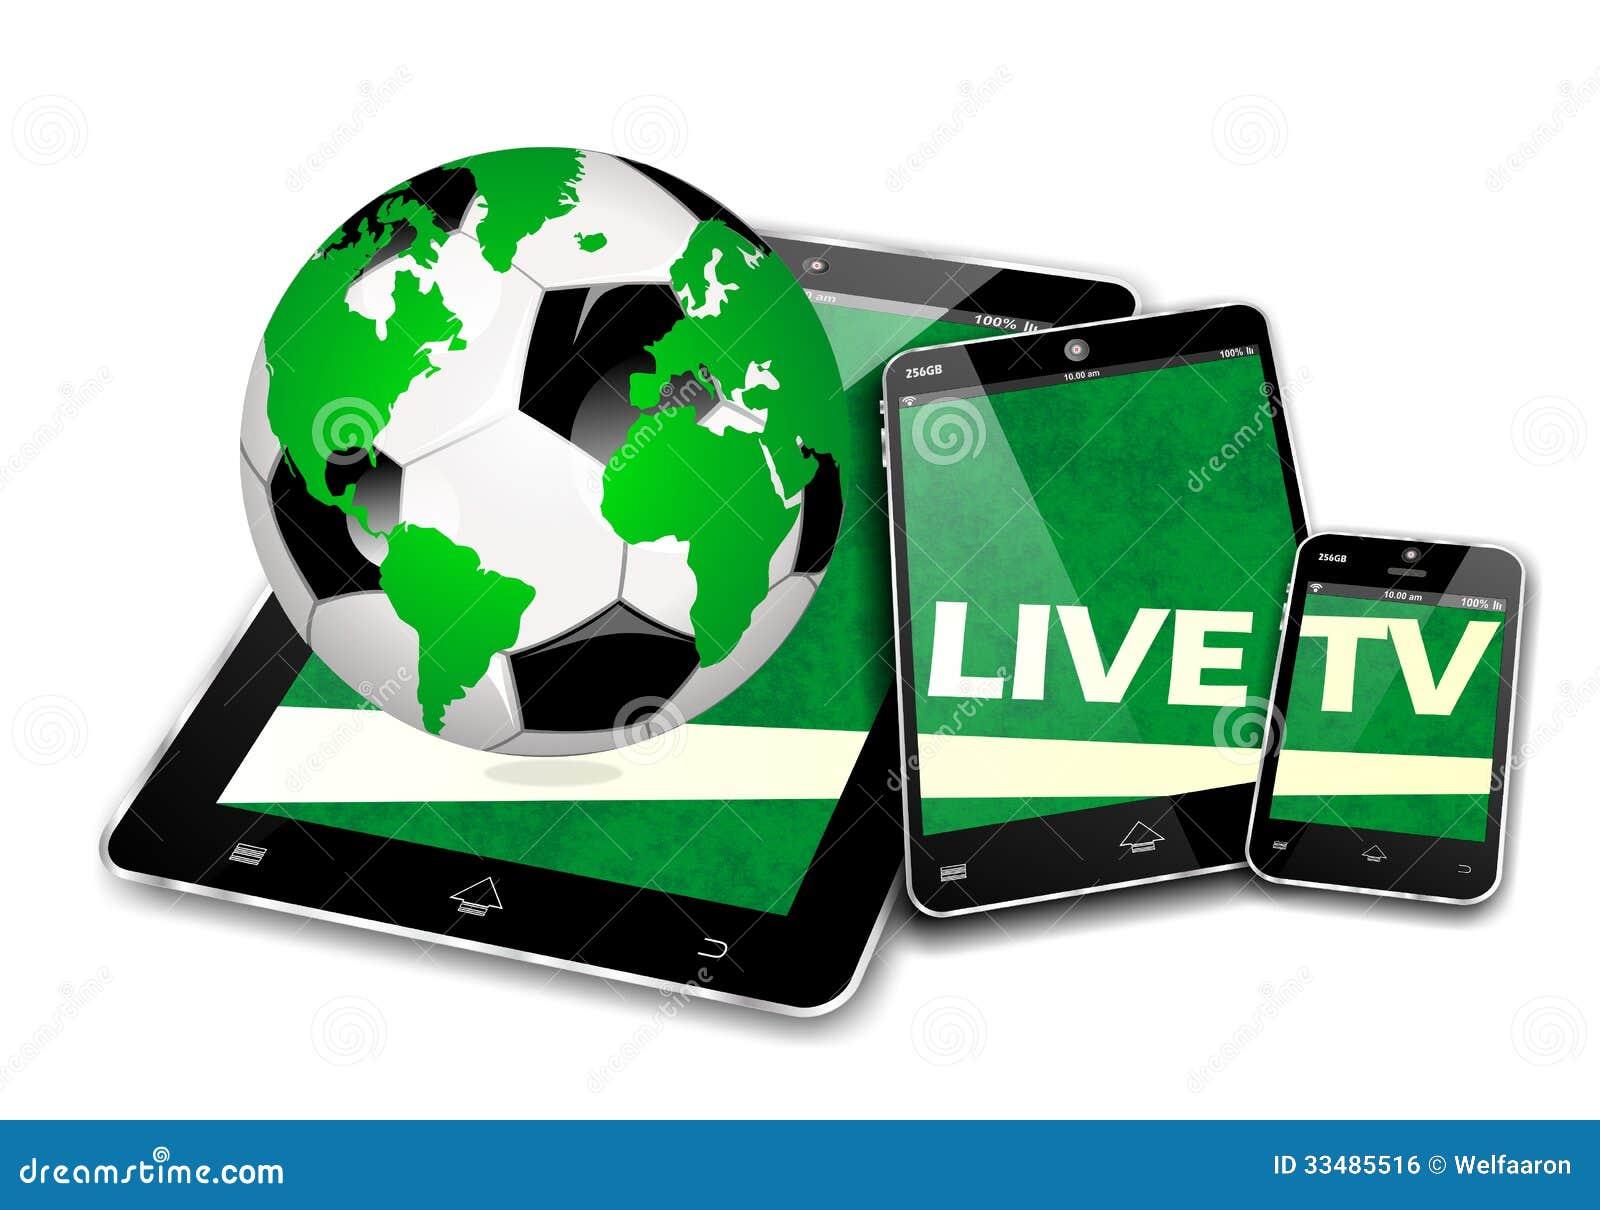 MOBILE SOCCER DEVICES, LIVE TV INTERNET BROADCAST.